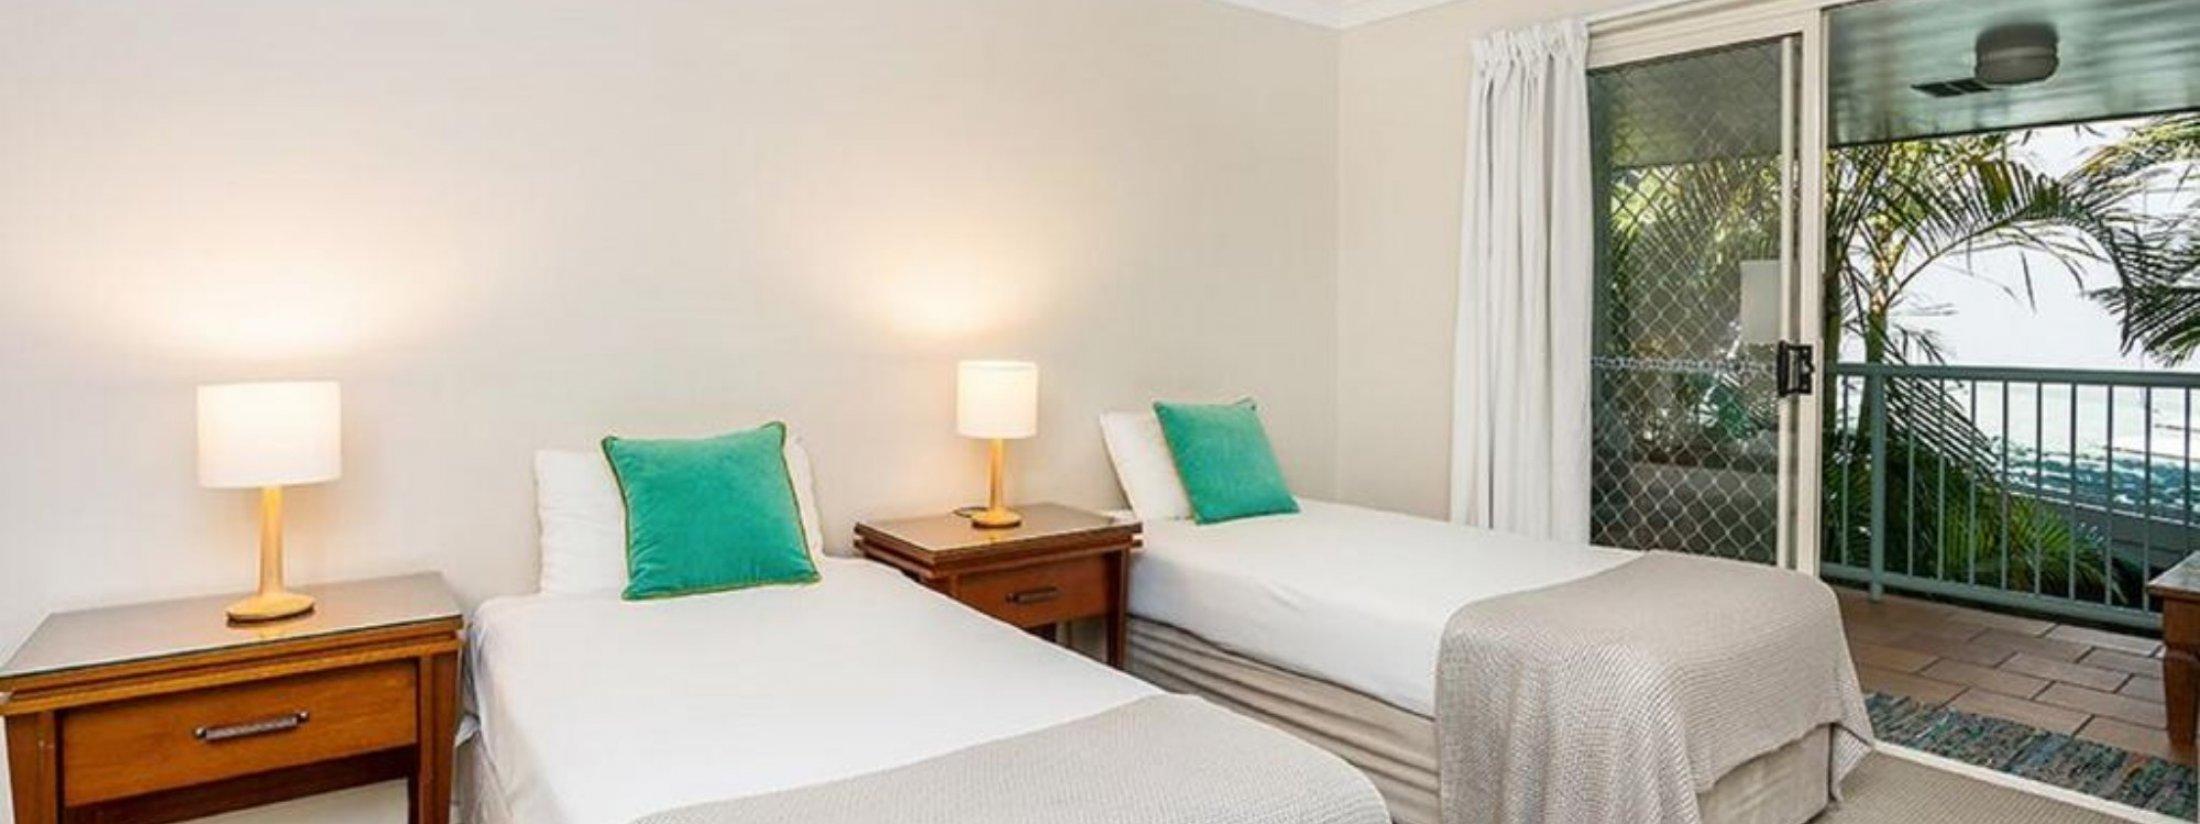 Heathers Hideaway - Byron Bay - Bedroom 2